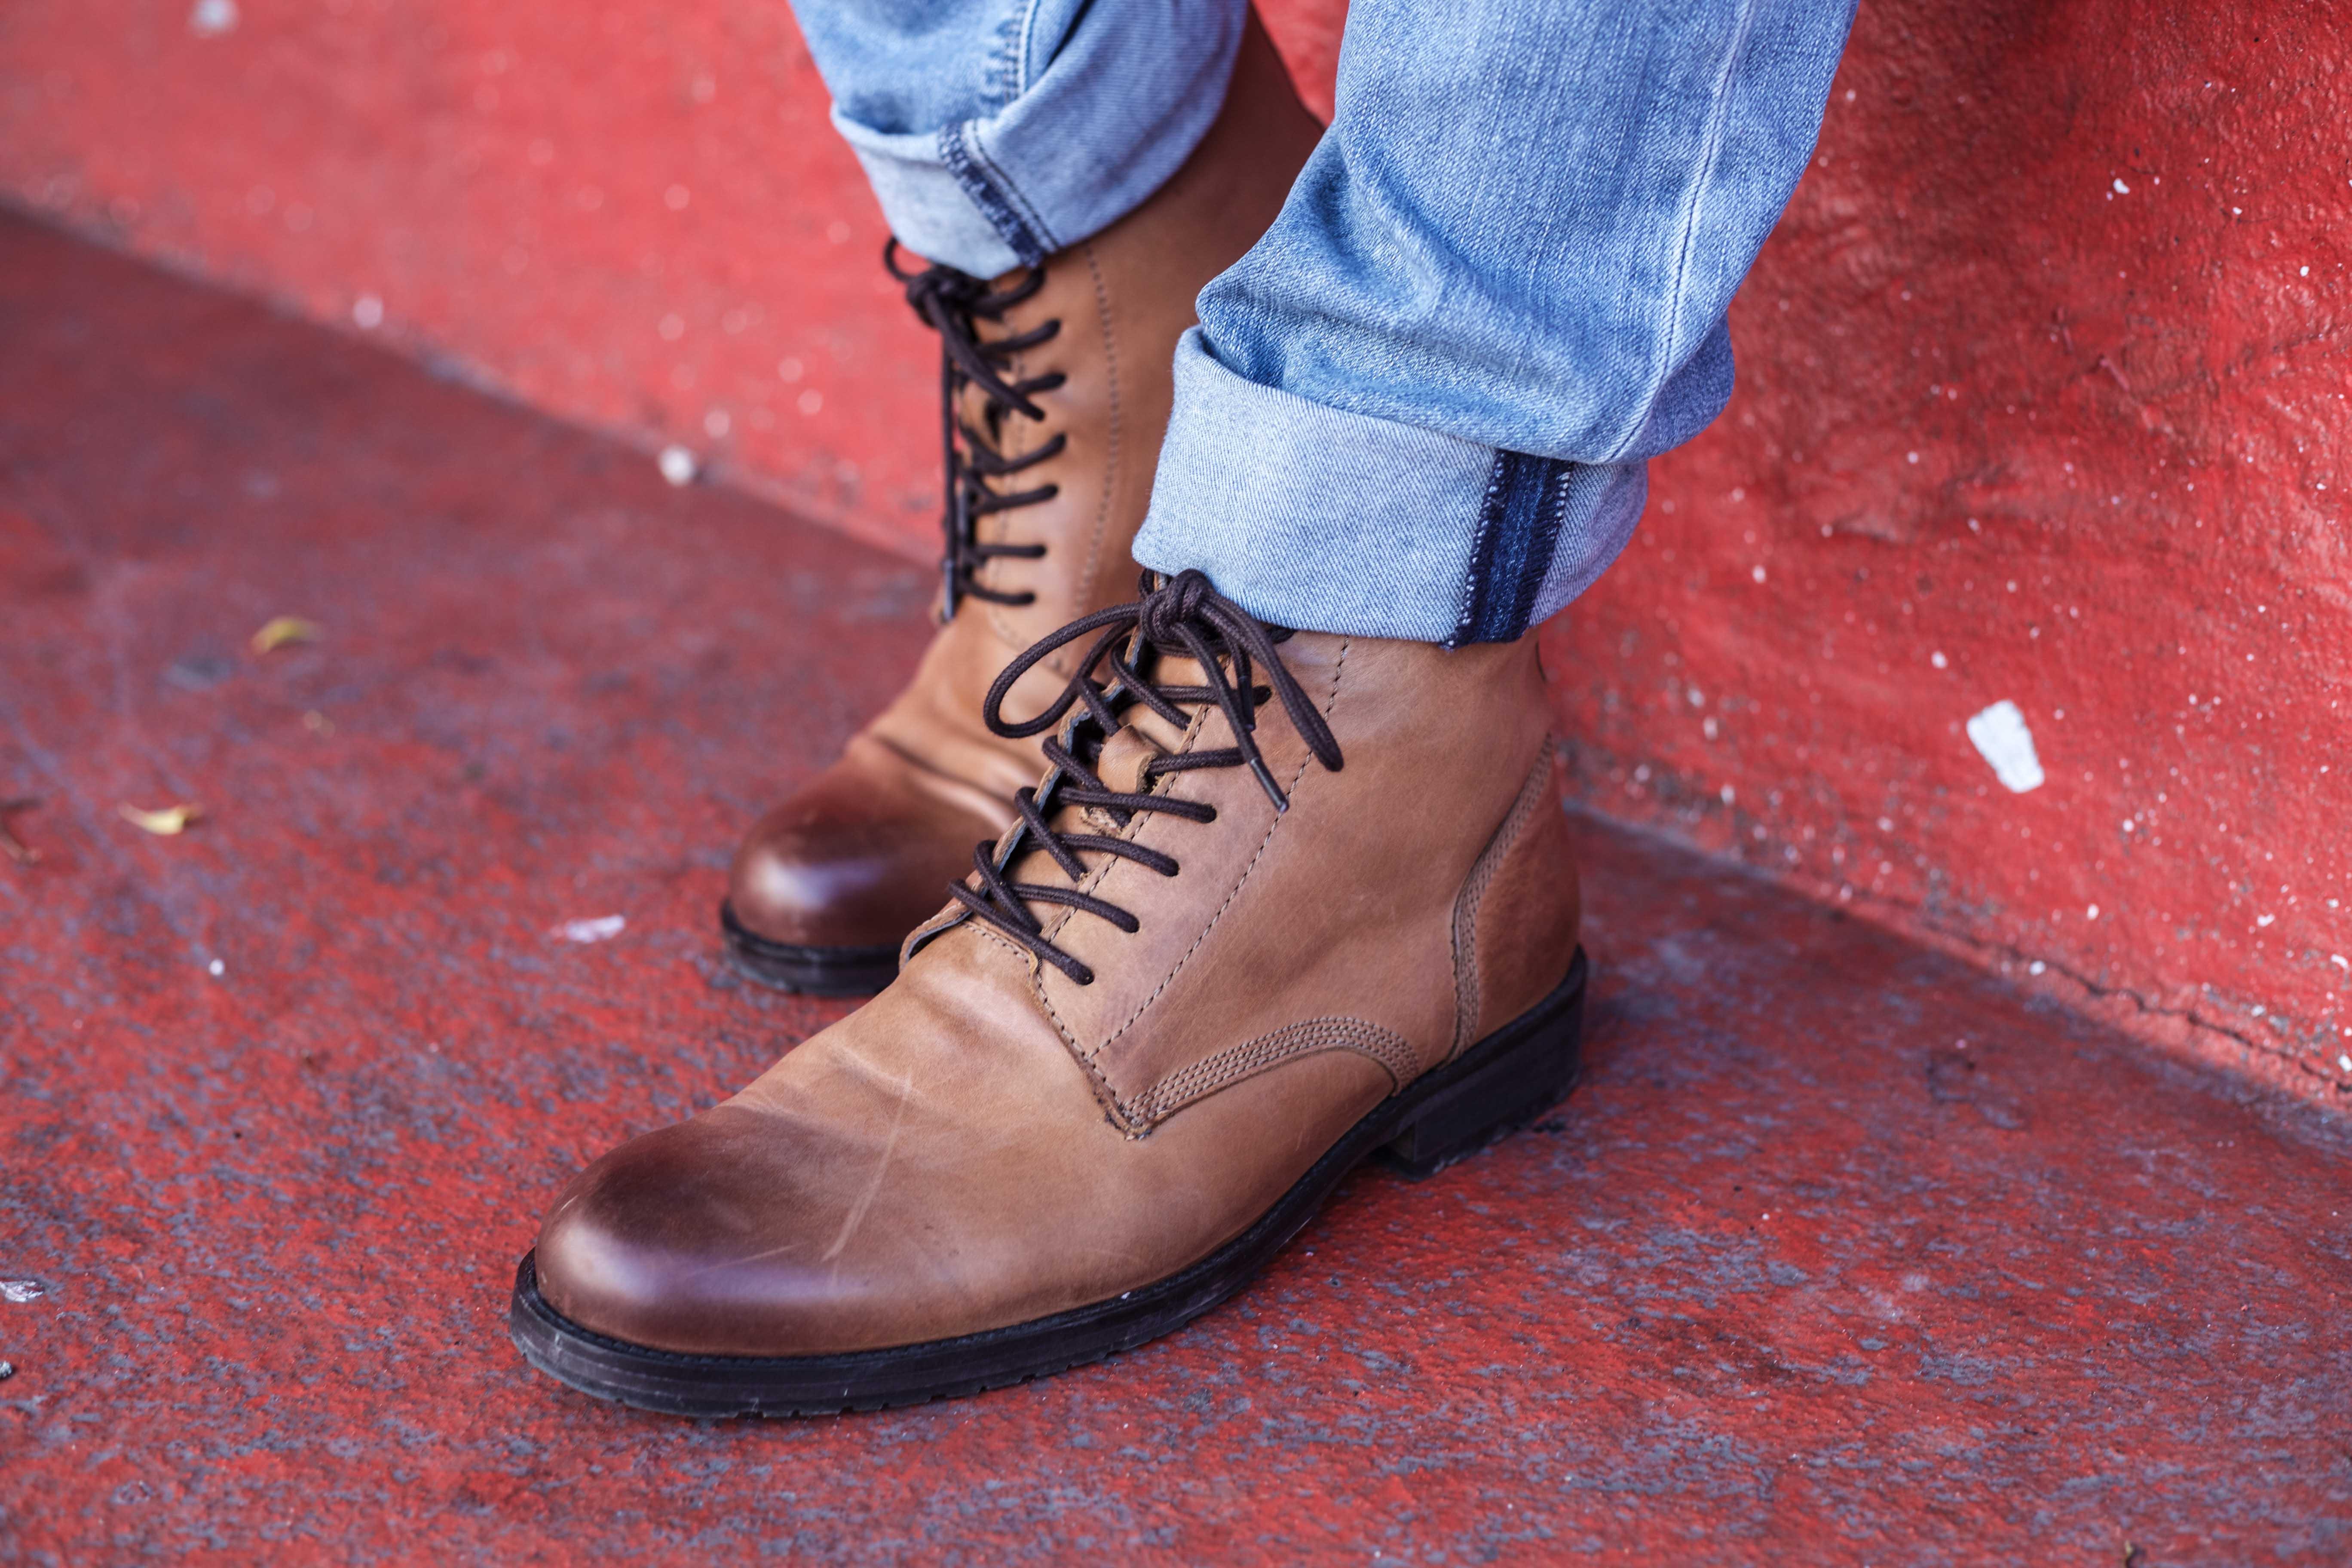 beiger-pullover-aufknoepfbarer-kragen-blaue-jeans-olivgruener-kurzparka-braune-lederstiefel-superkilen-kopenhagen_5865